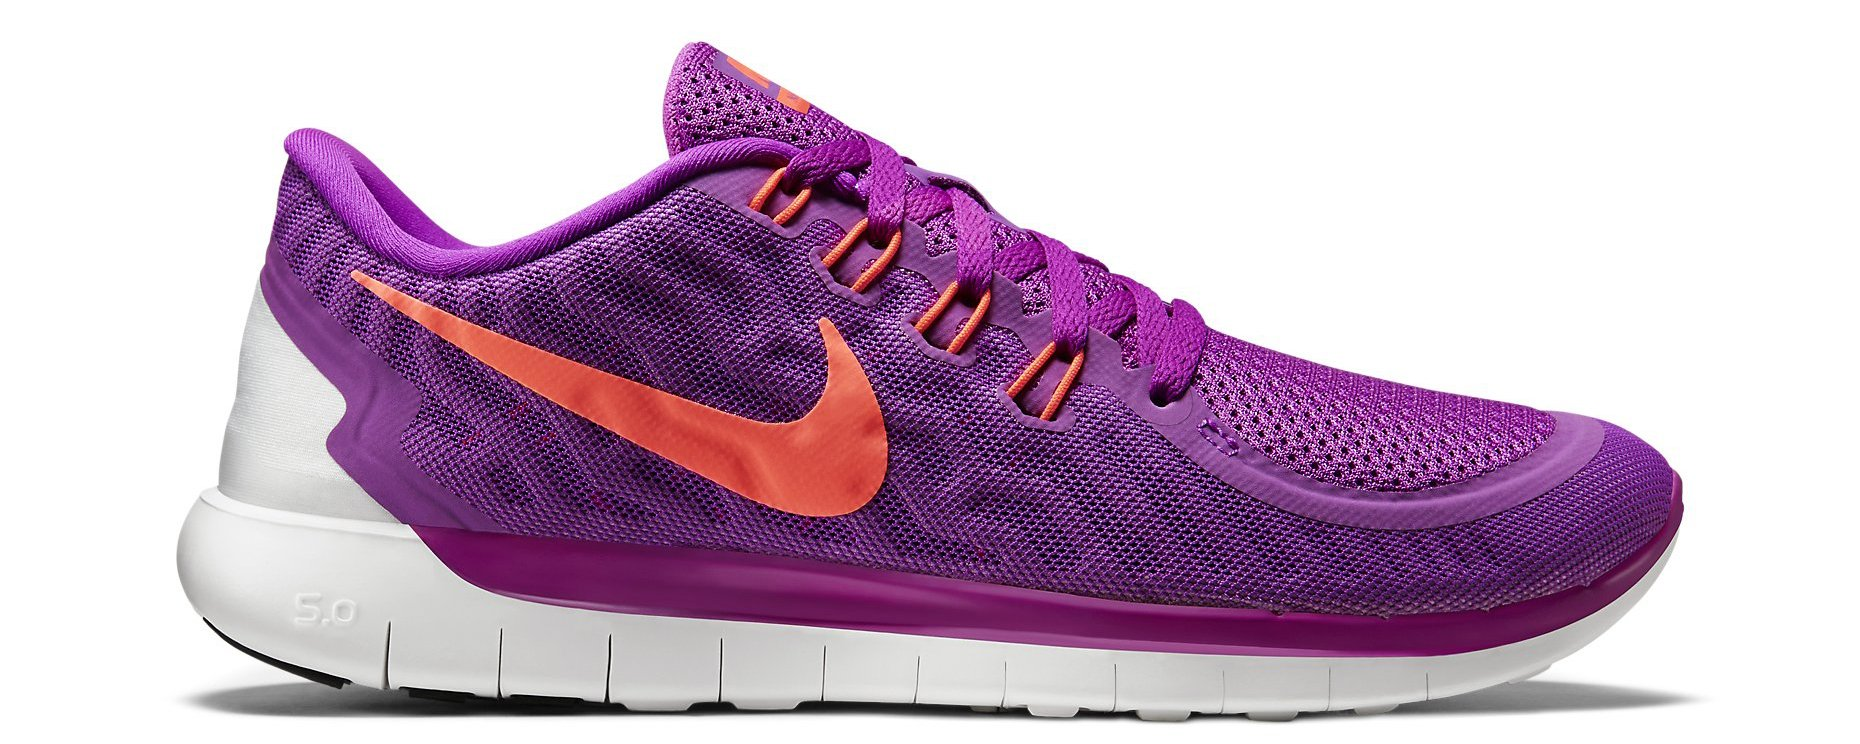 Běžecké boty Nike WMNS  FREE 5.0